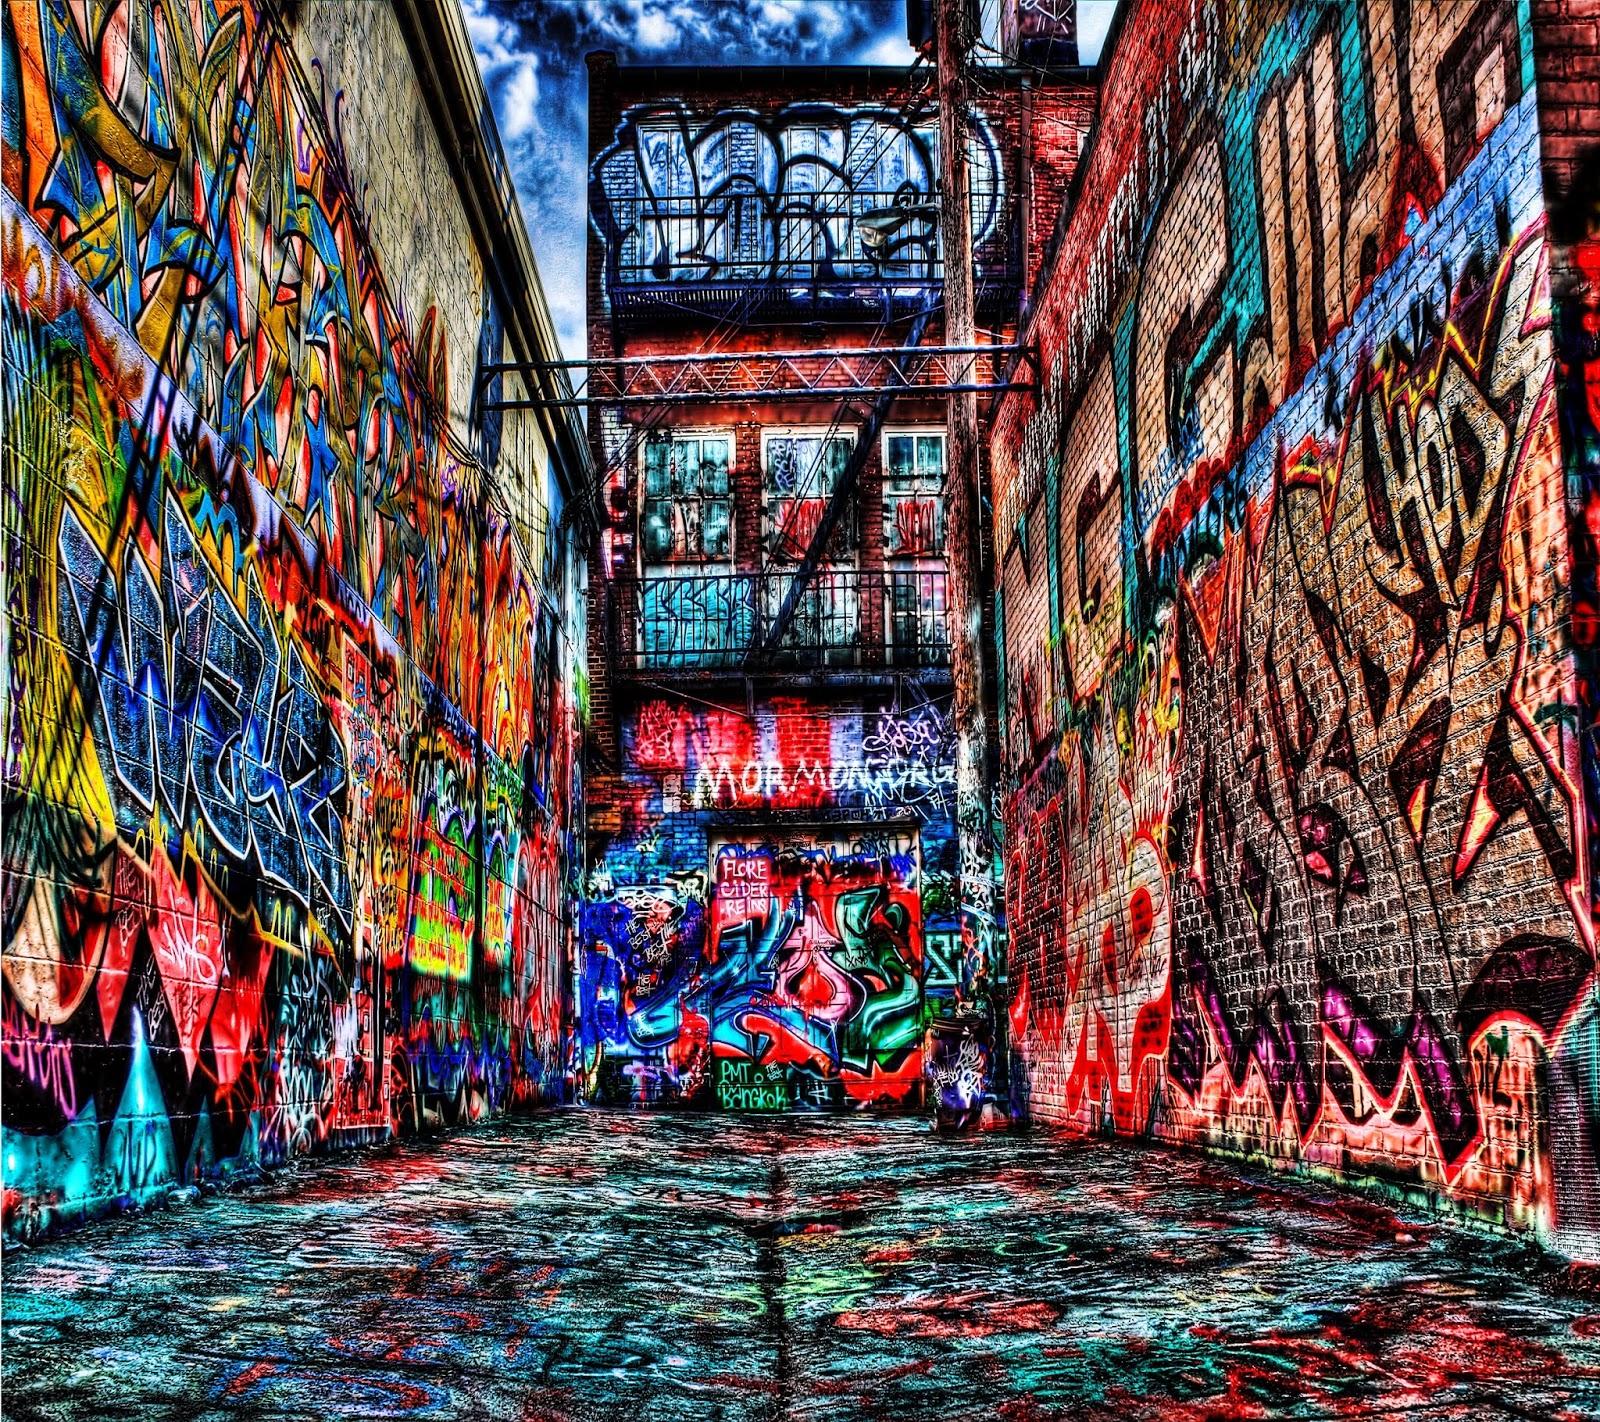 248 2481052 wallpaper graffiti keren untuk hp android graffiti wallpaper